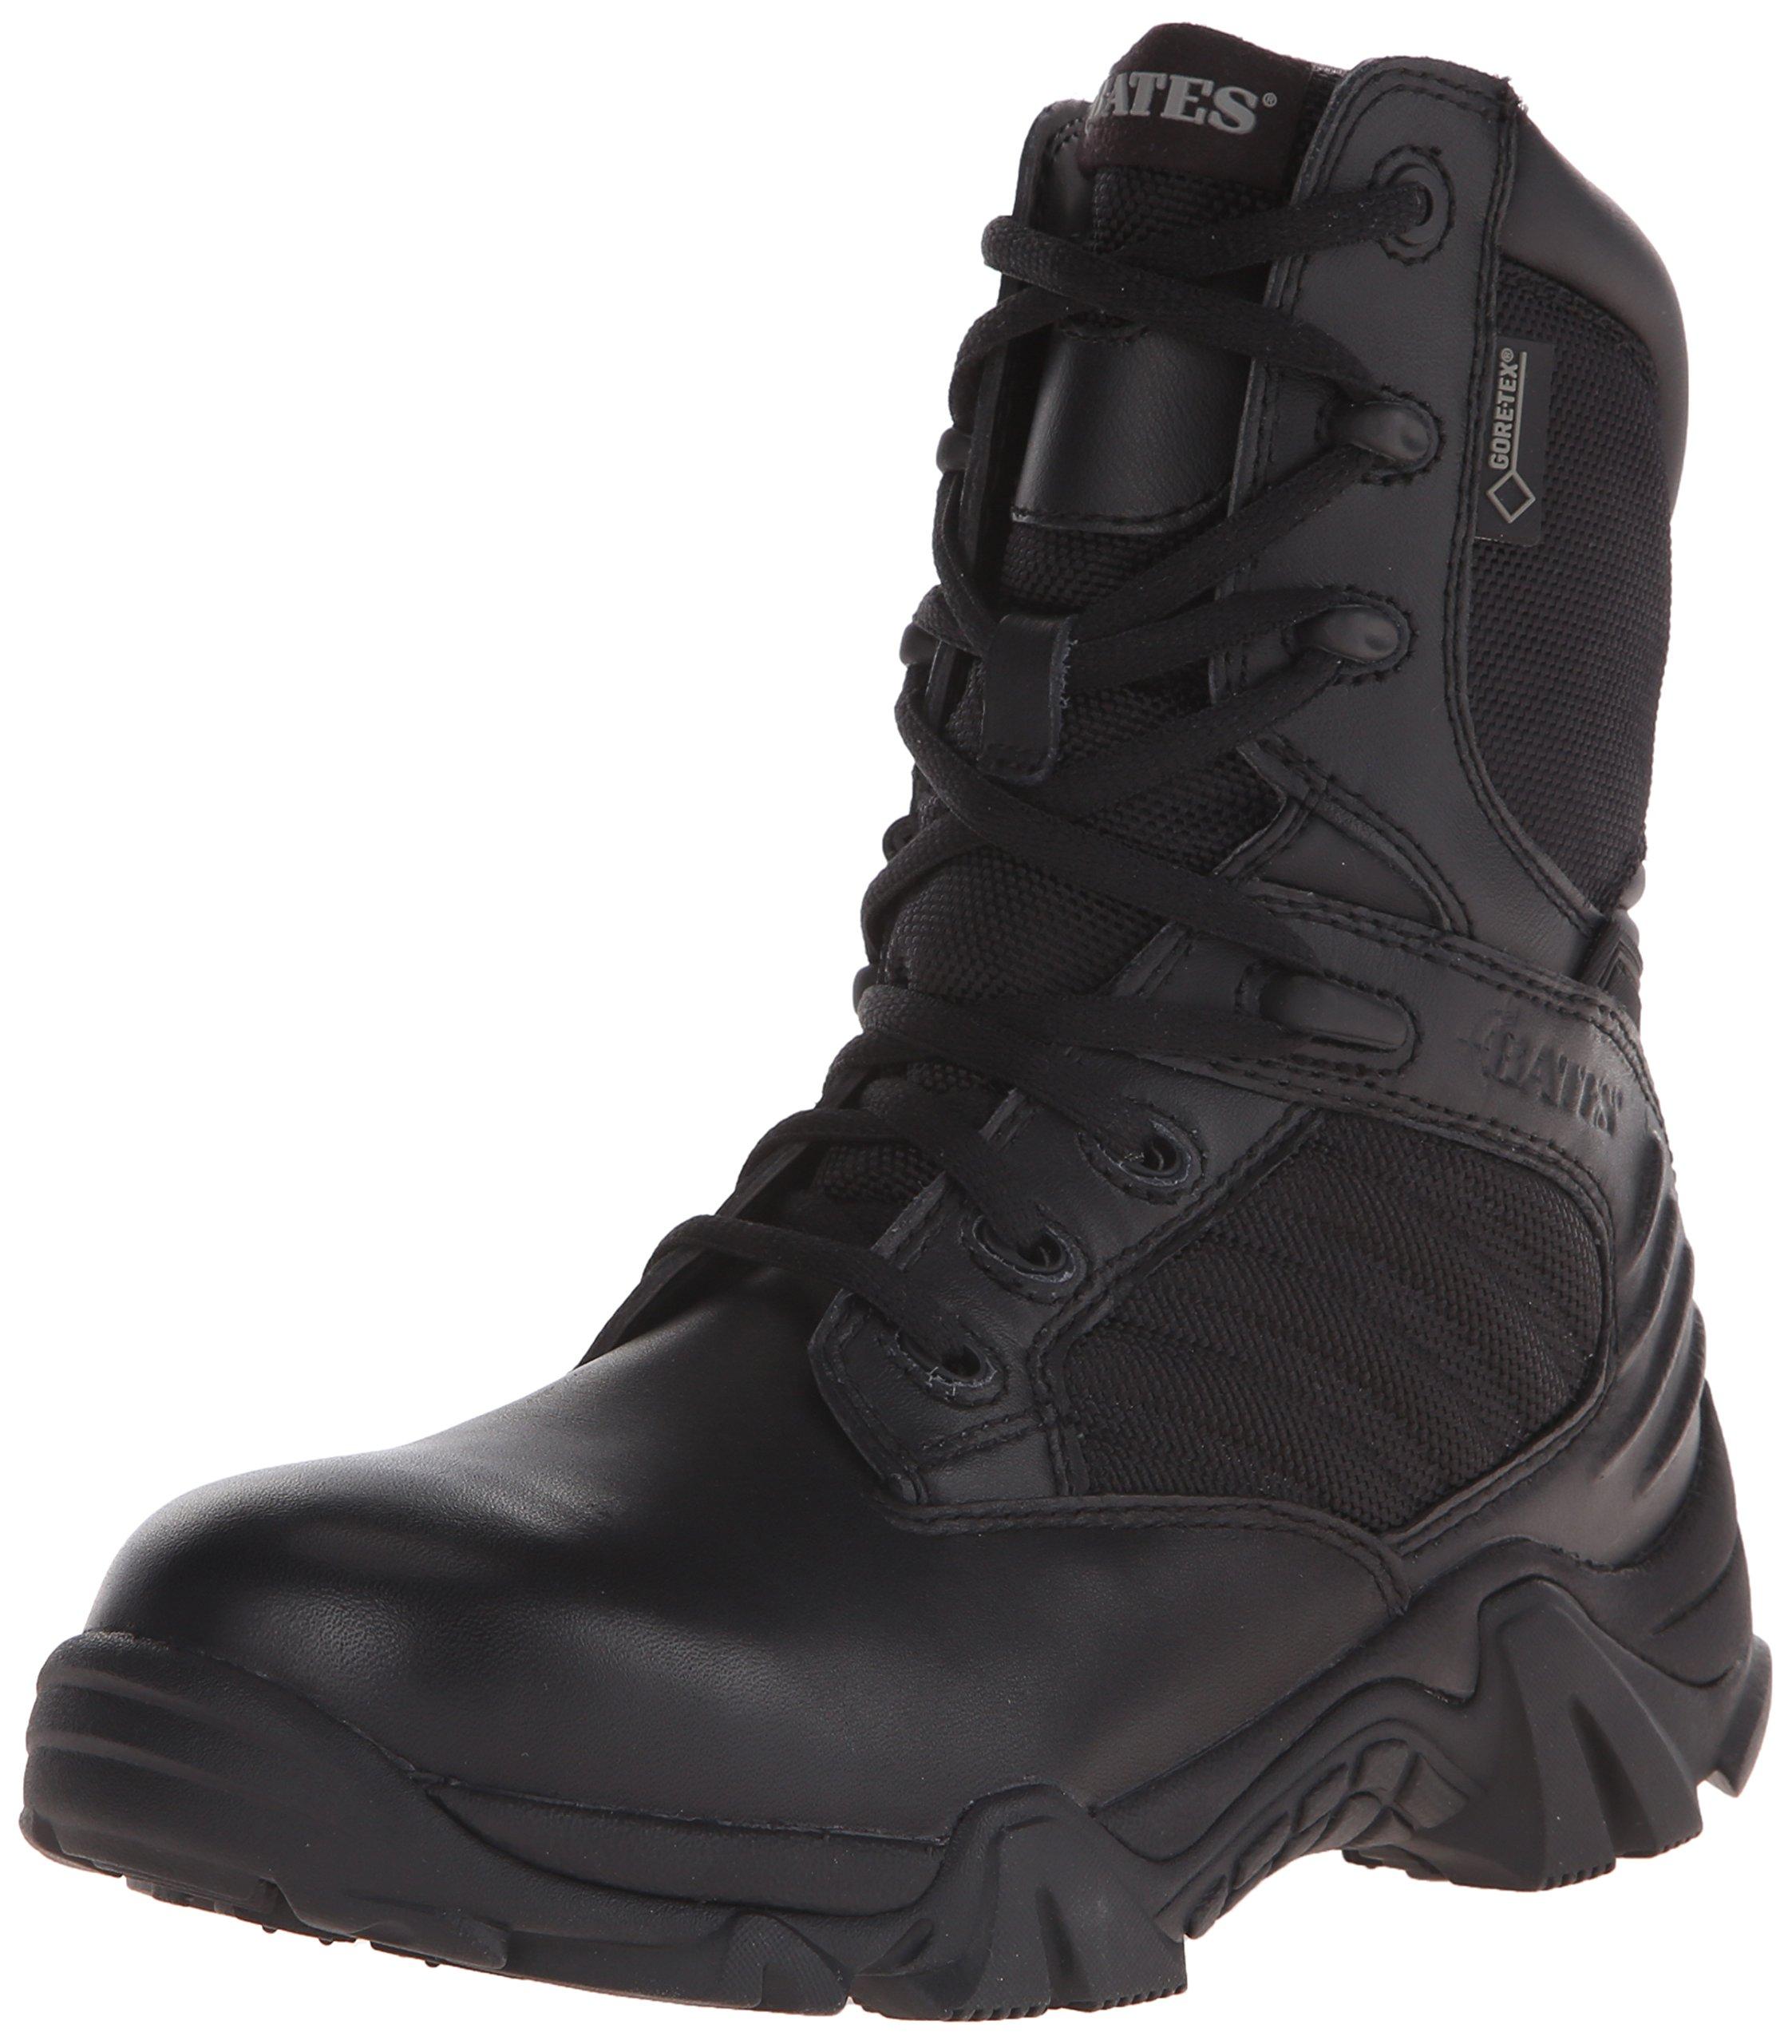 Bates Women's Gx-8 8 Inch Boot, Black, 8.5 M US by Bates